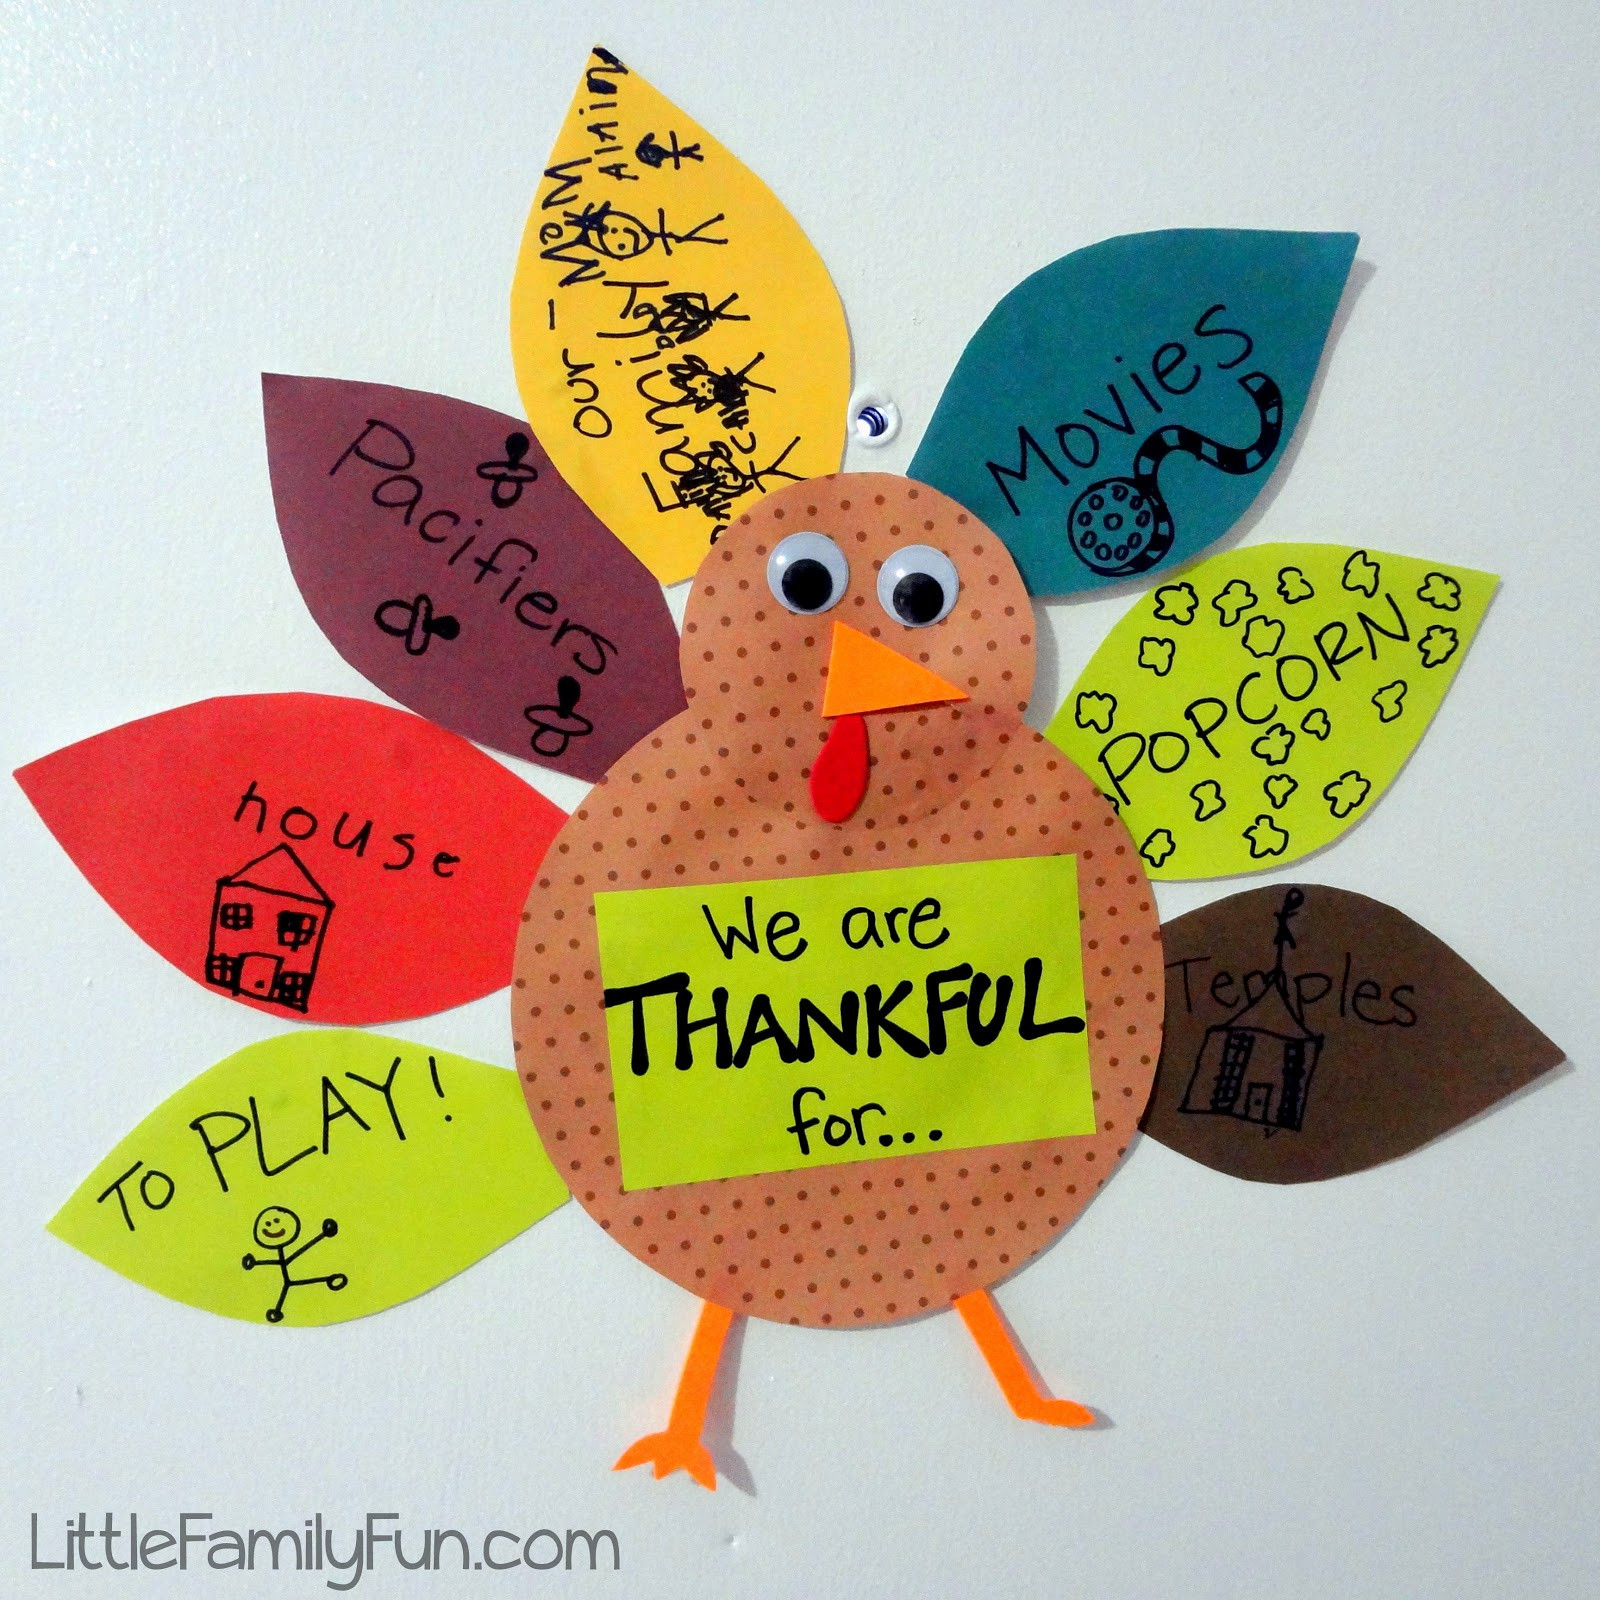 Thanksgiving Turkey Projects  Little Family Fun Gratitude Turkey 2012 Thanksgiving